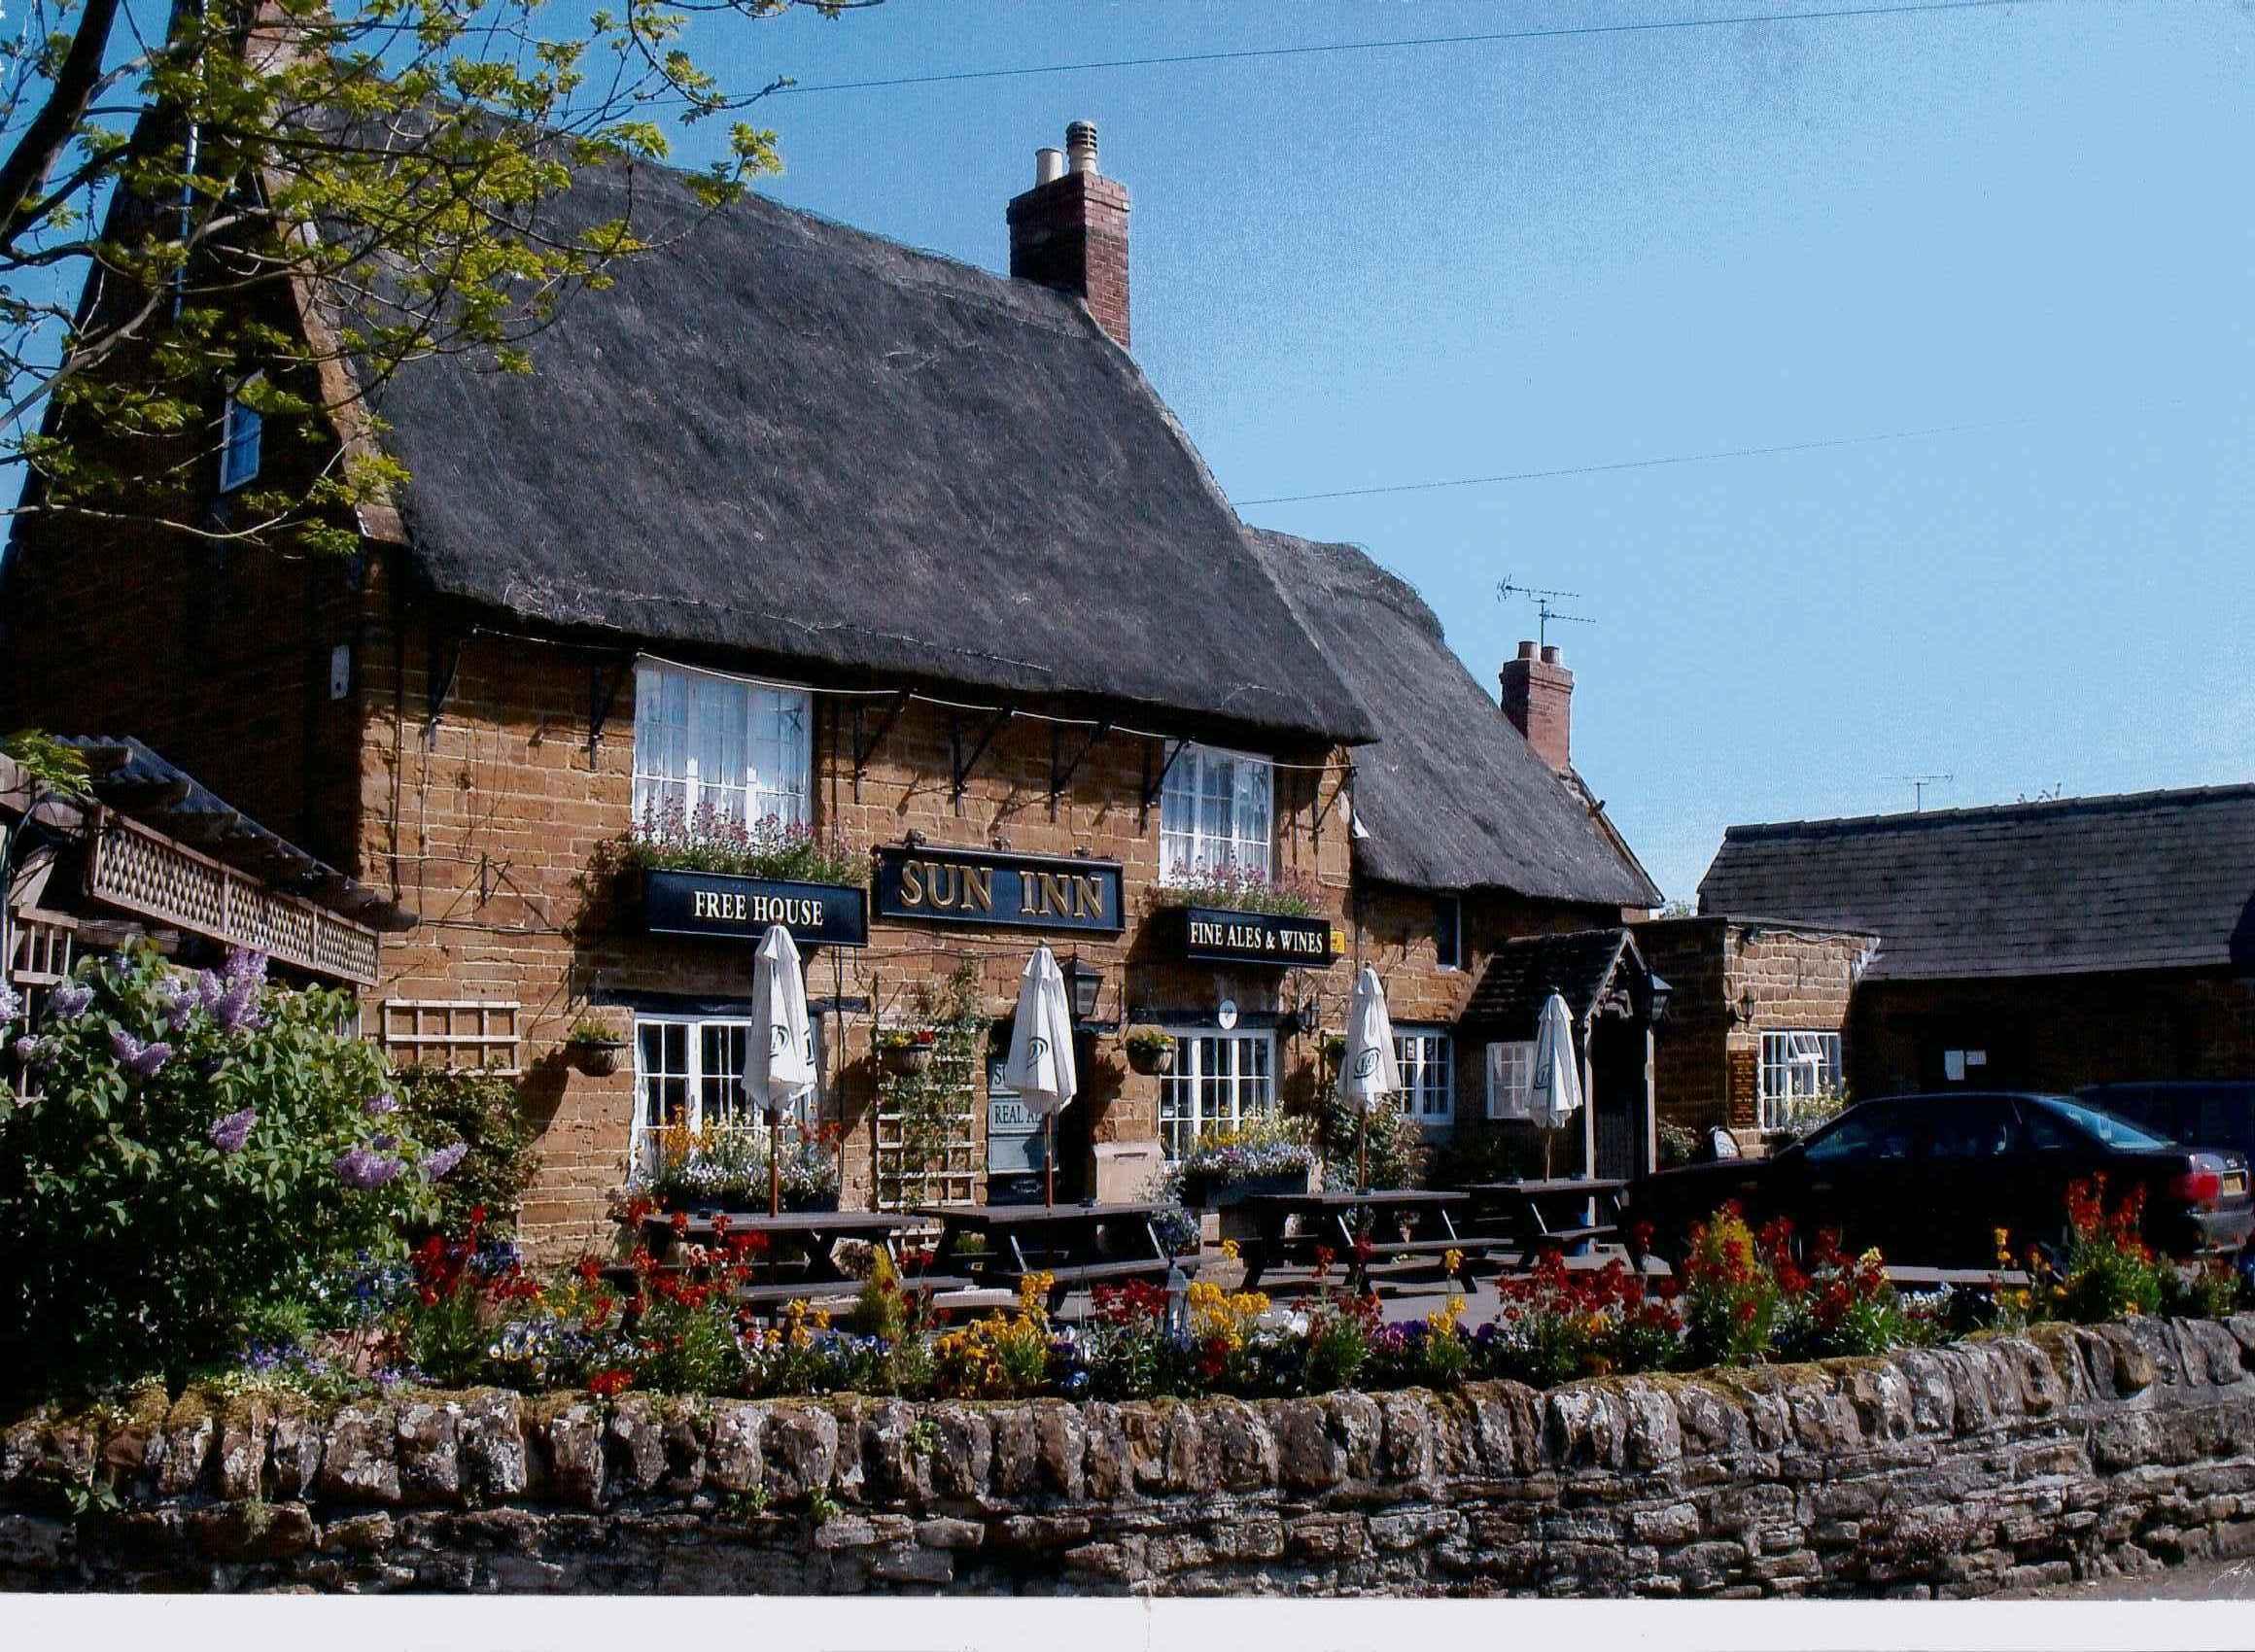 black bottom pubs in northampton jpg 1080x810